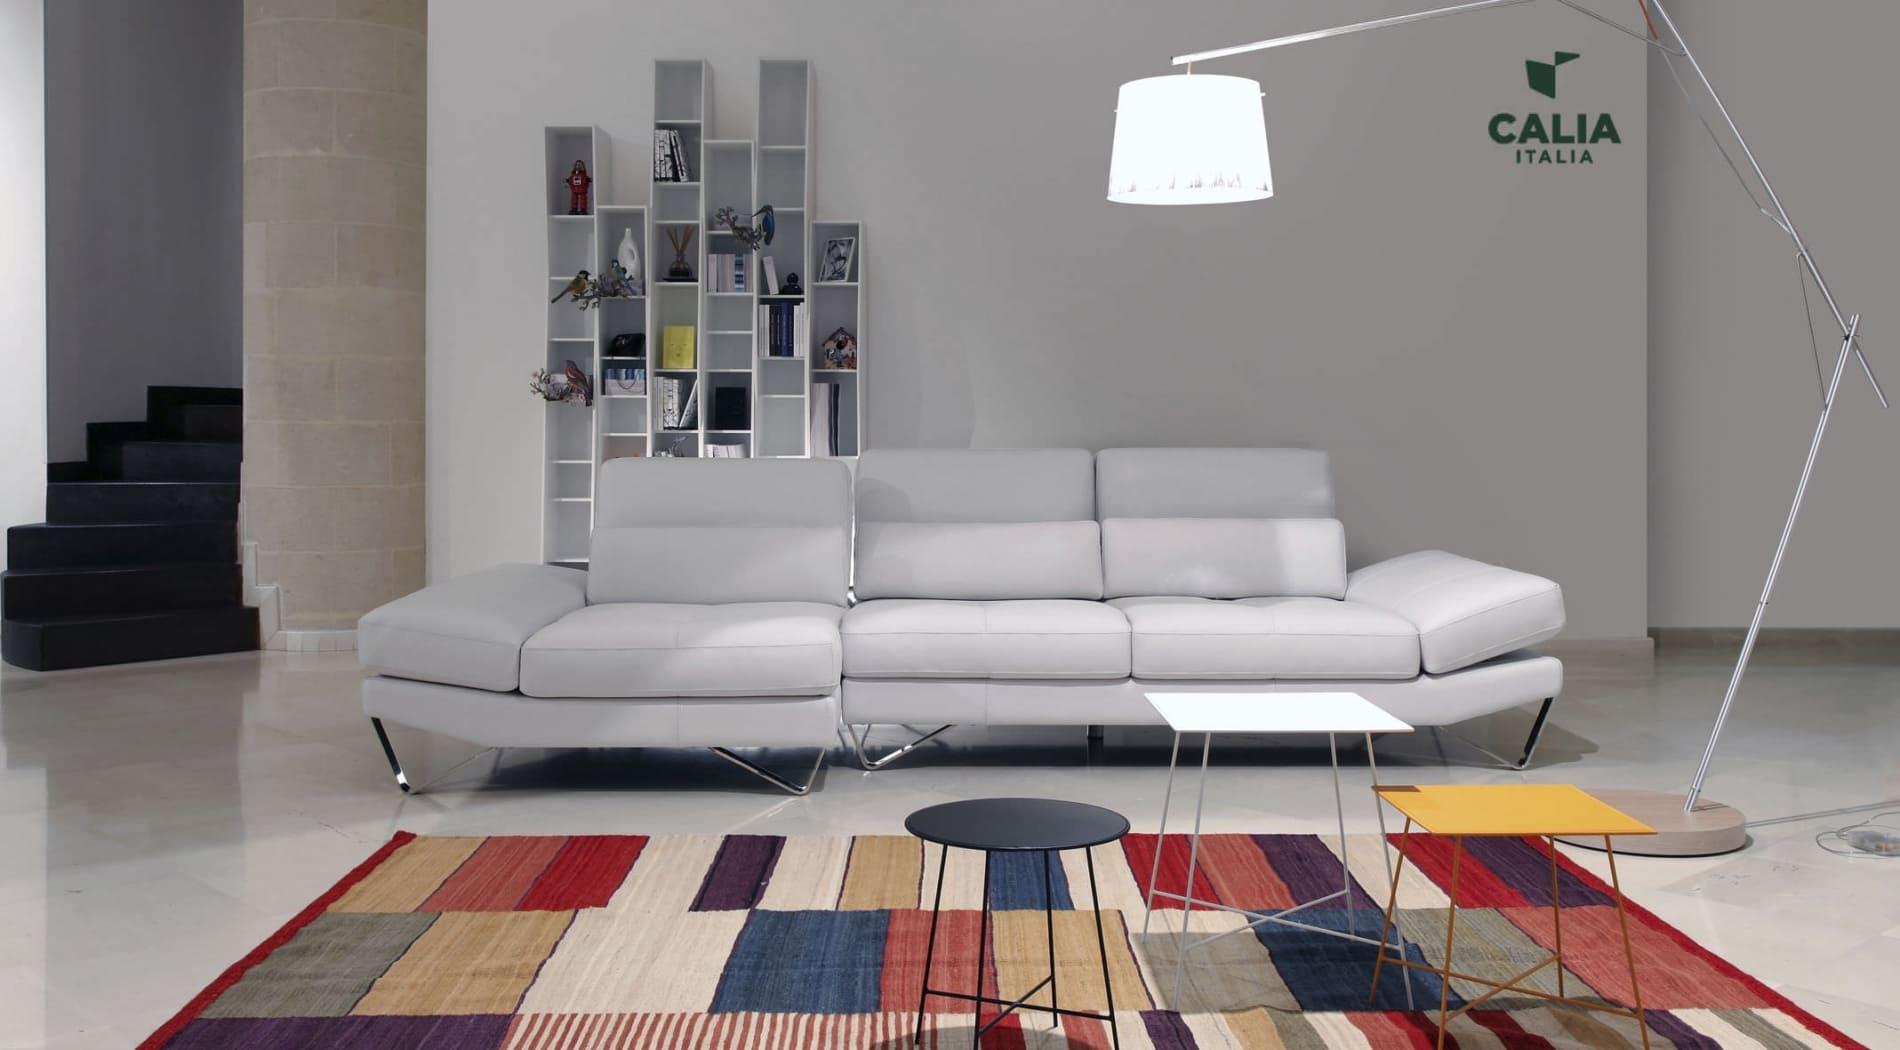 calia italia cameo 800 yanni poly center. Black Bedroom Furniture Sets. Home Design Ideas